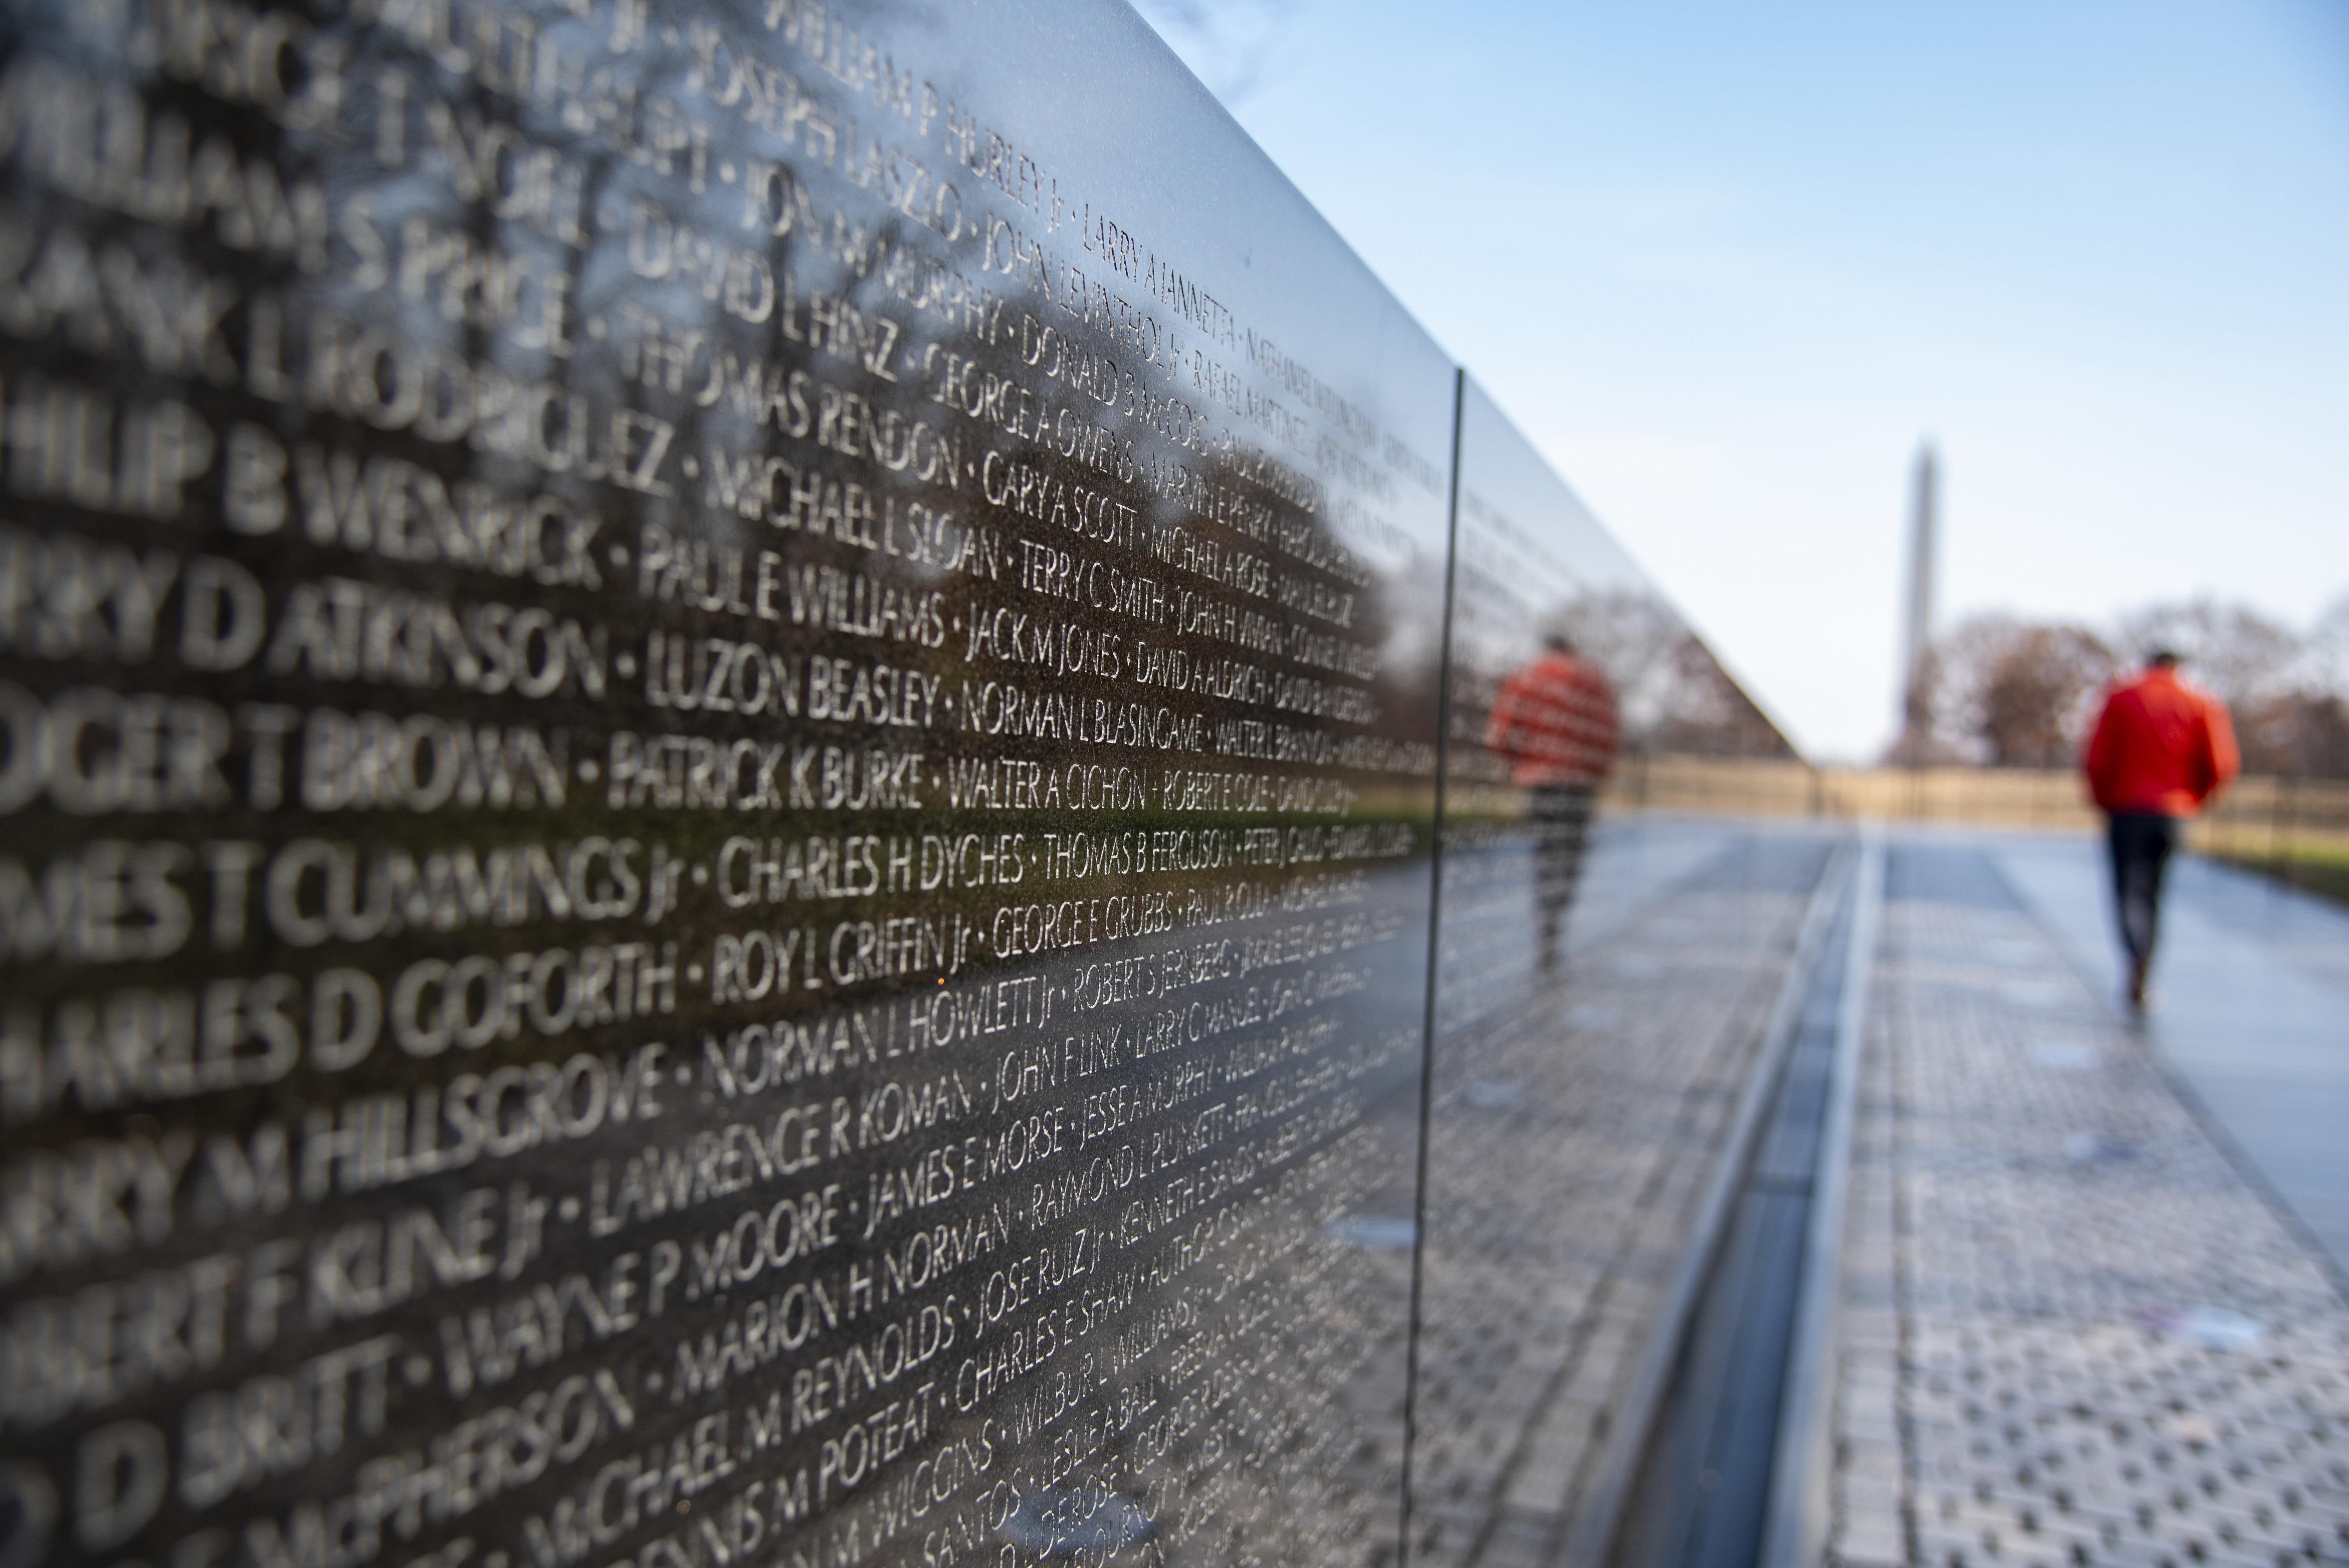 Audit Finds Misspellings Duplicates On Vietnam Wall